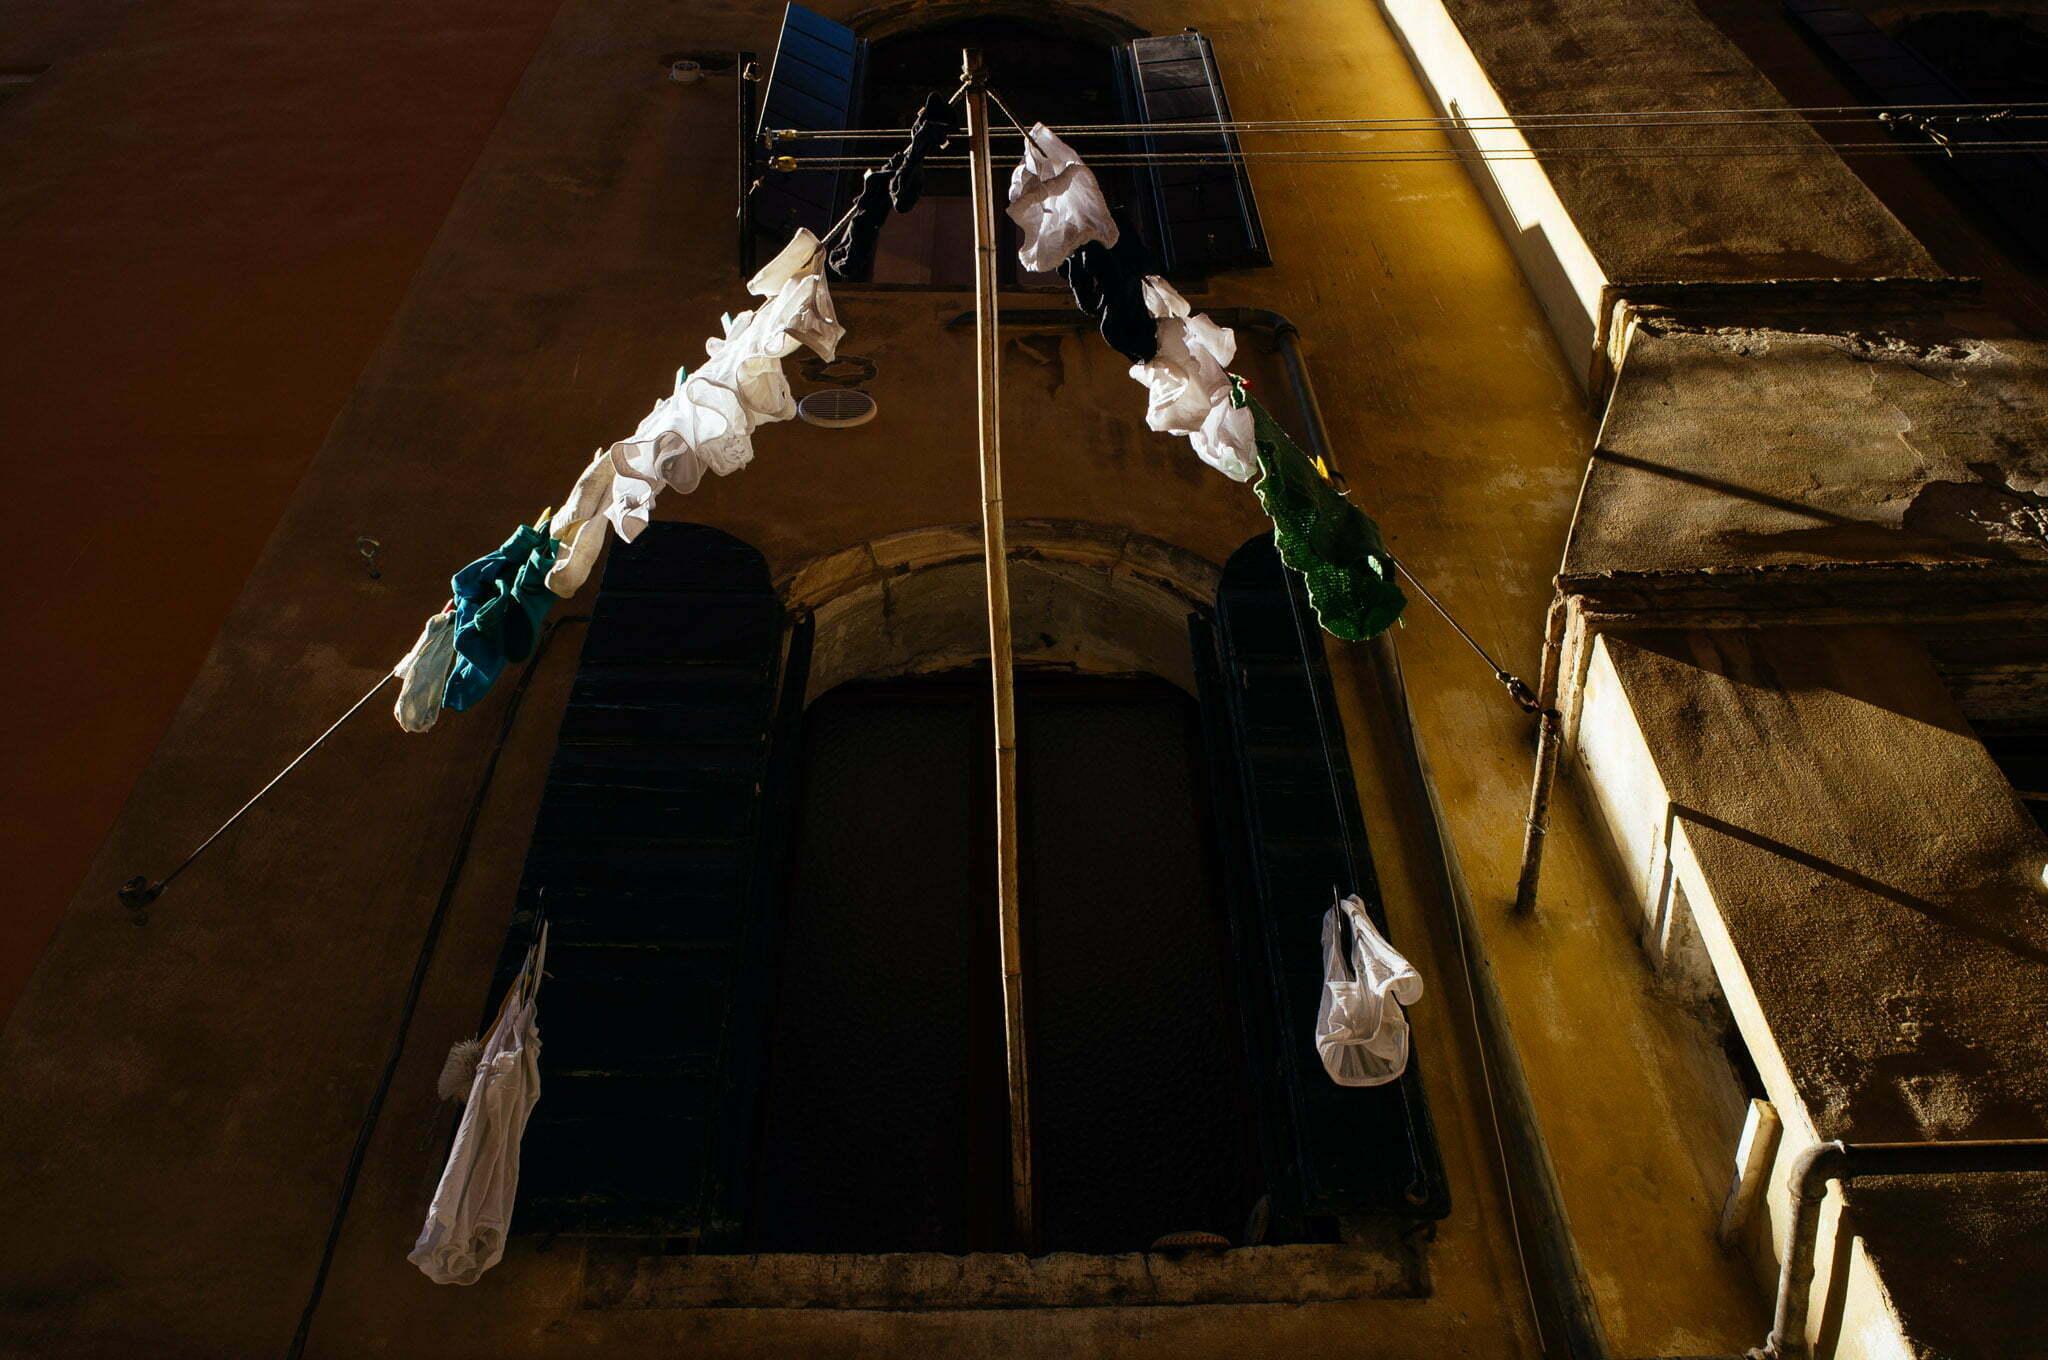 venice-washing-lines-5146